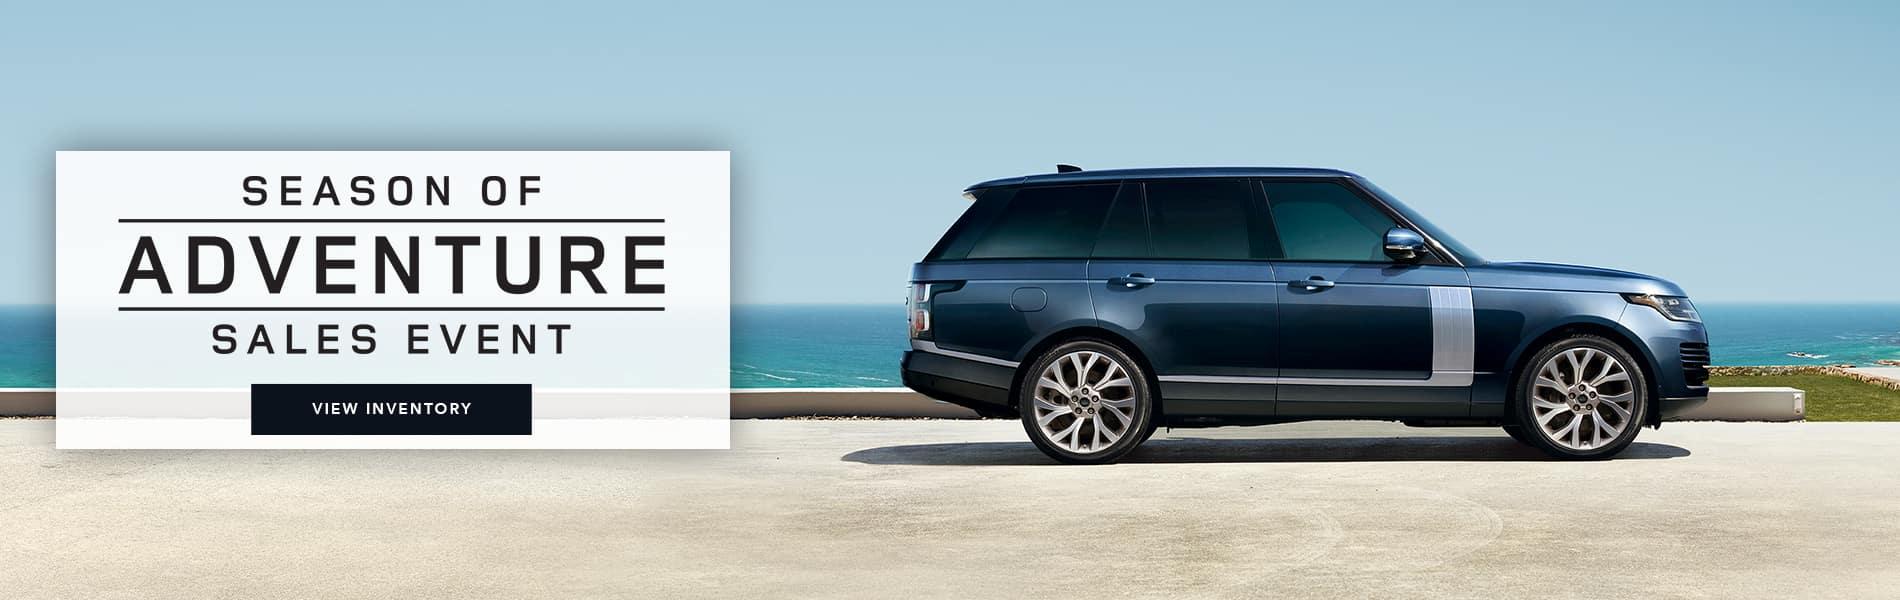 Land Rover Sales Event | Season Of Adventure Sales Event